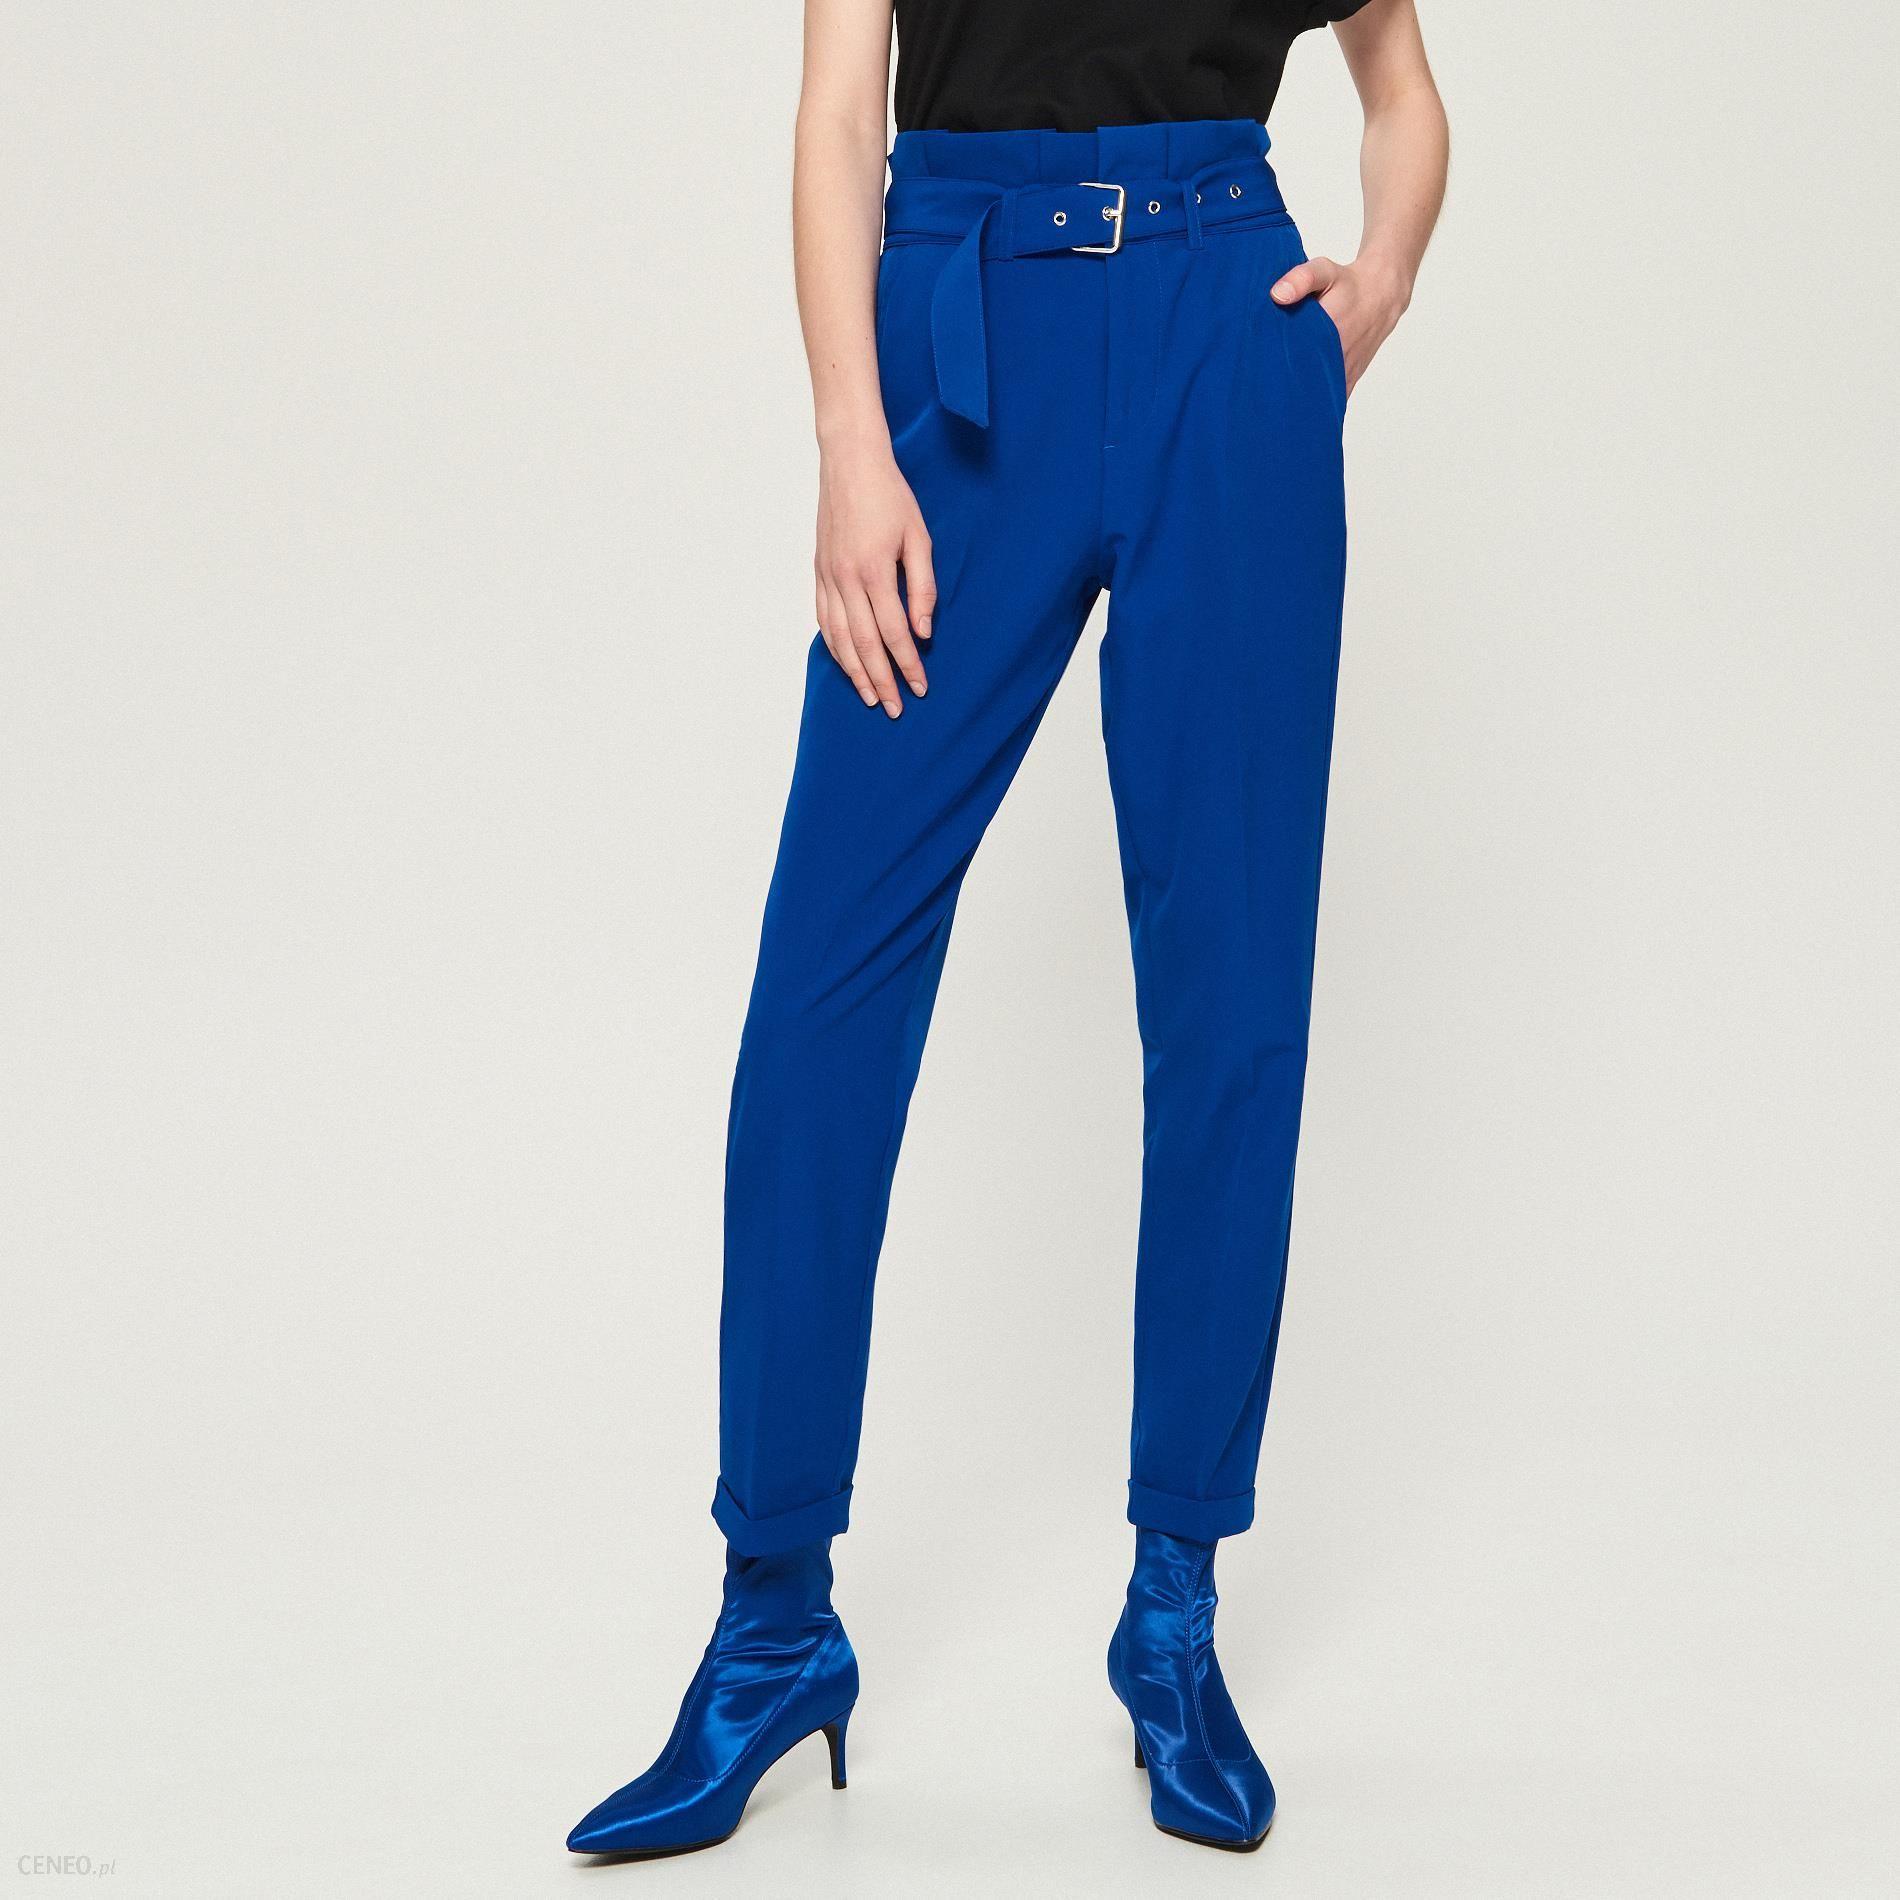 256f1d40b592 Sinsay - Spodnie paperbag z paskiem - Niebieski - Ceny i opinie ...